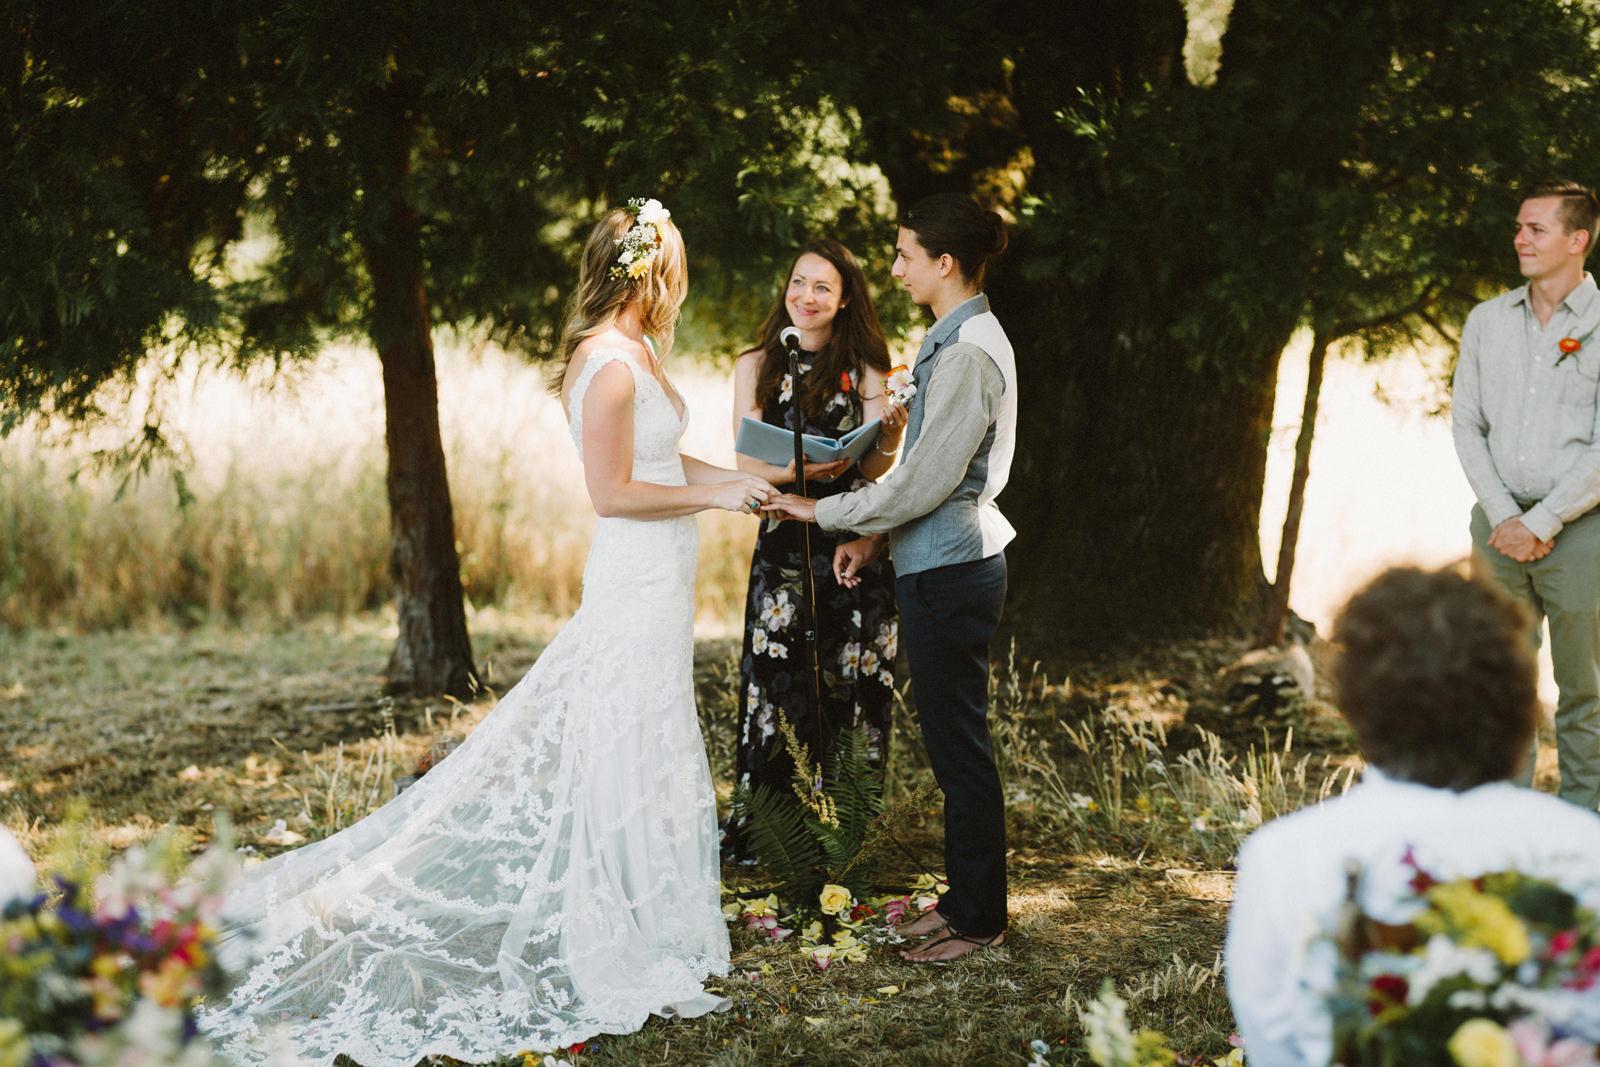 rivers-bend-retreat-wedding-034 RIVER'S BEND RETREAT WEDDING